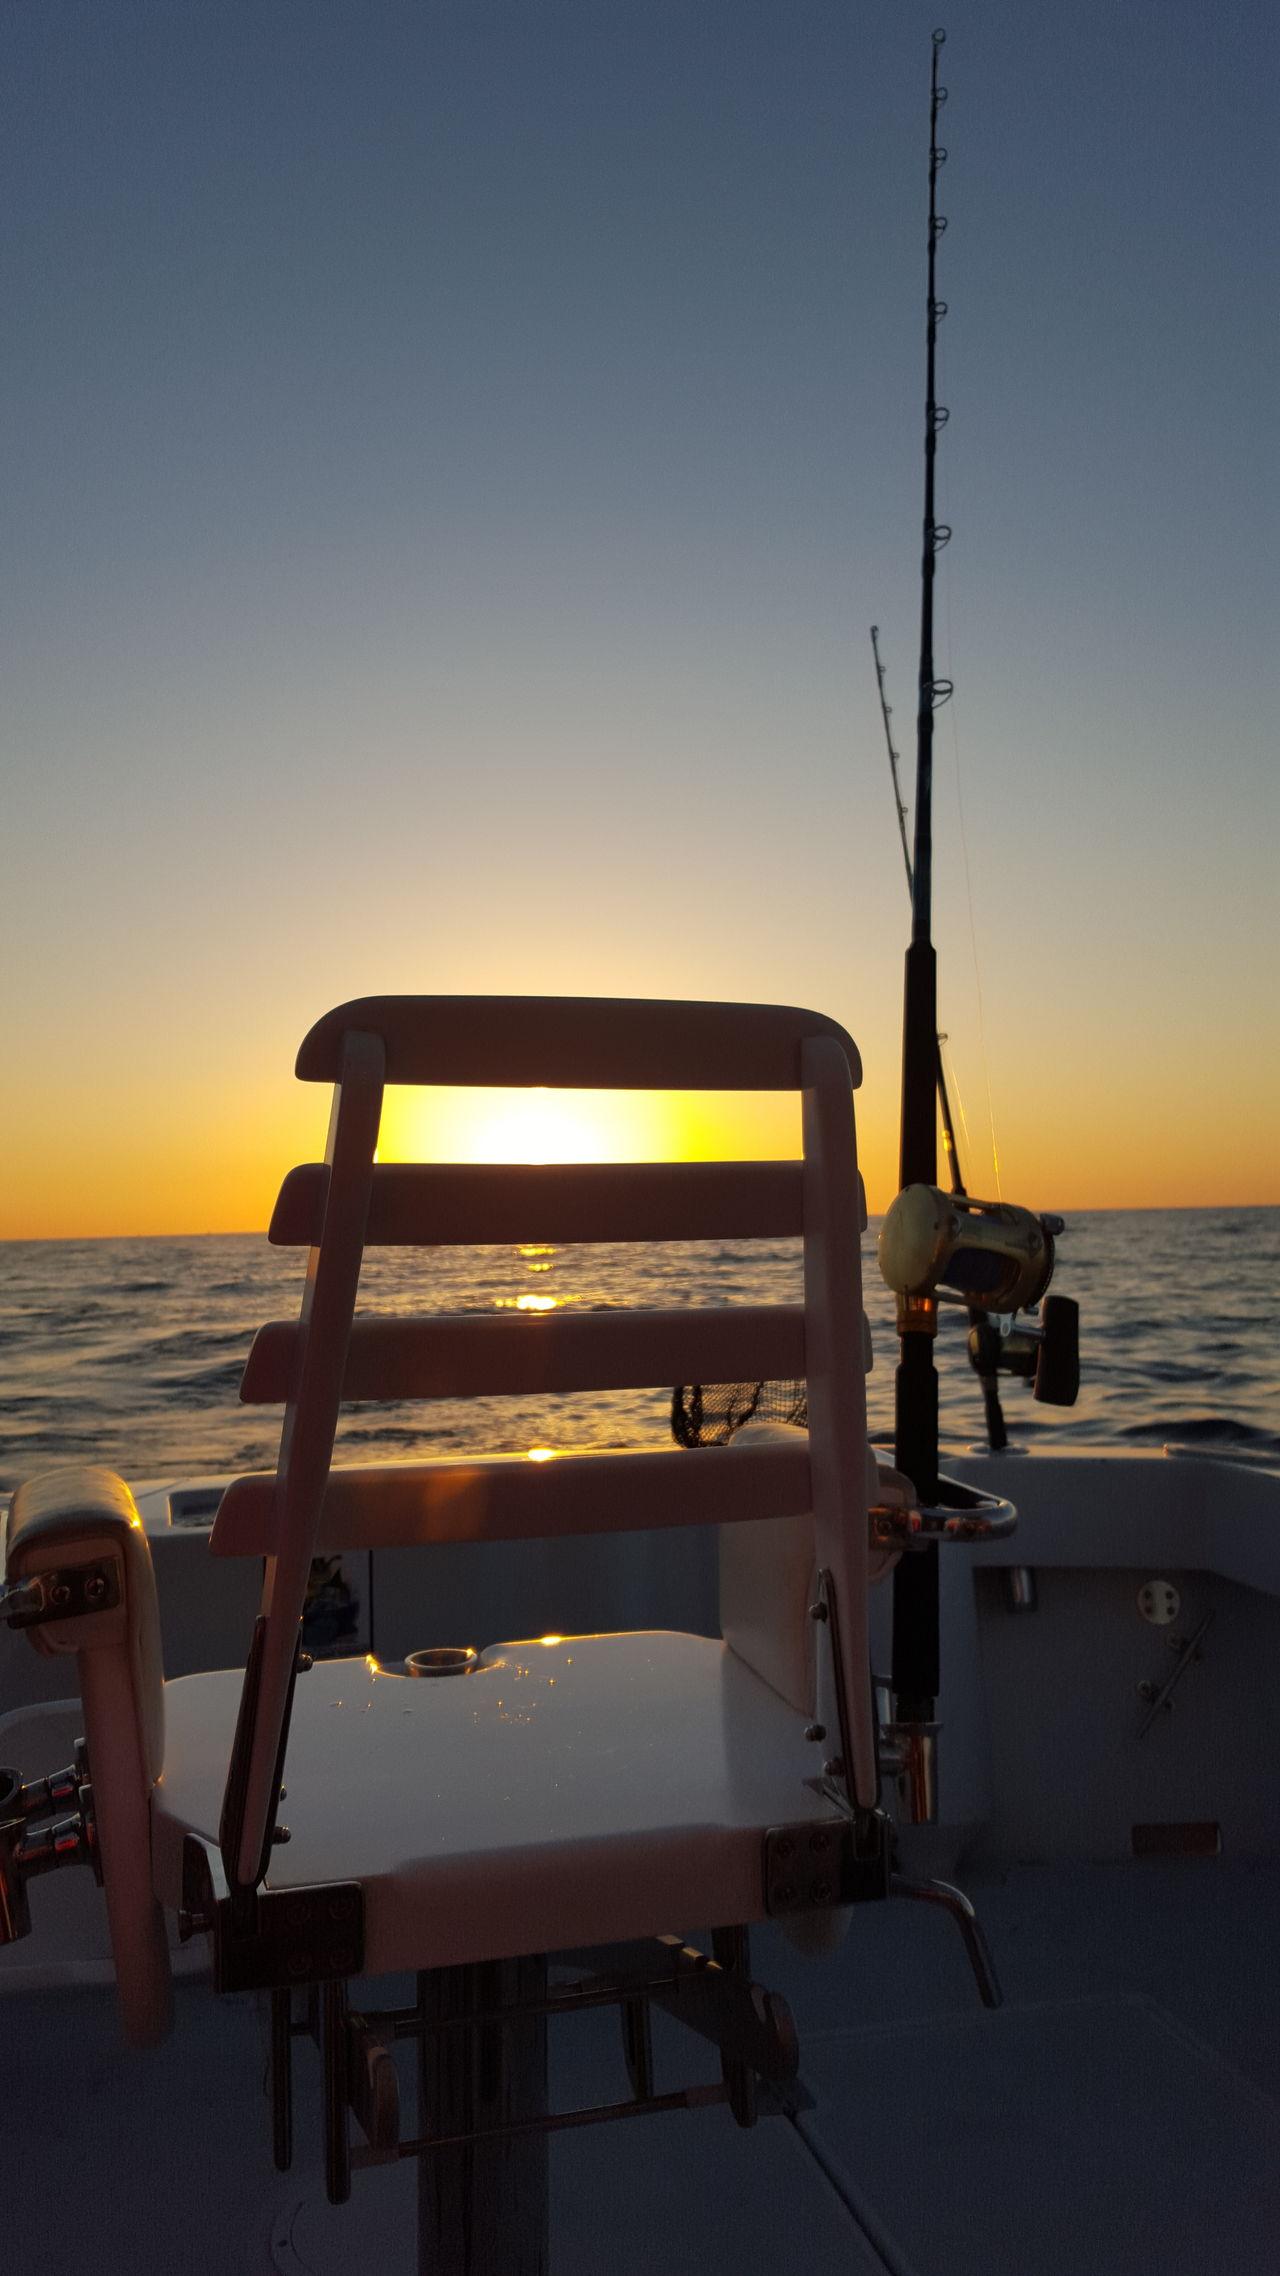 Sunrise. Mexico Fishing Vacation Los Cabos Pacific Ocean